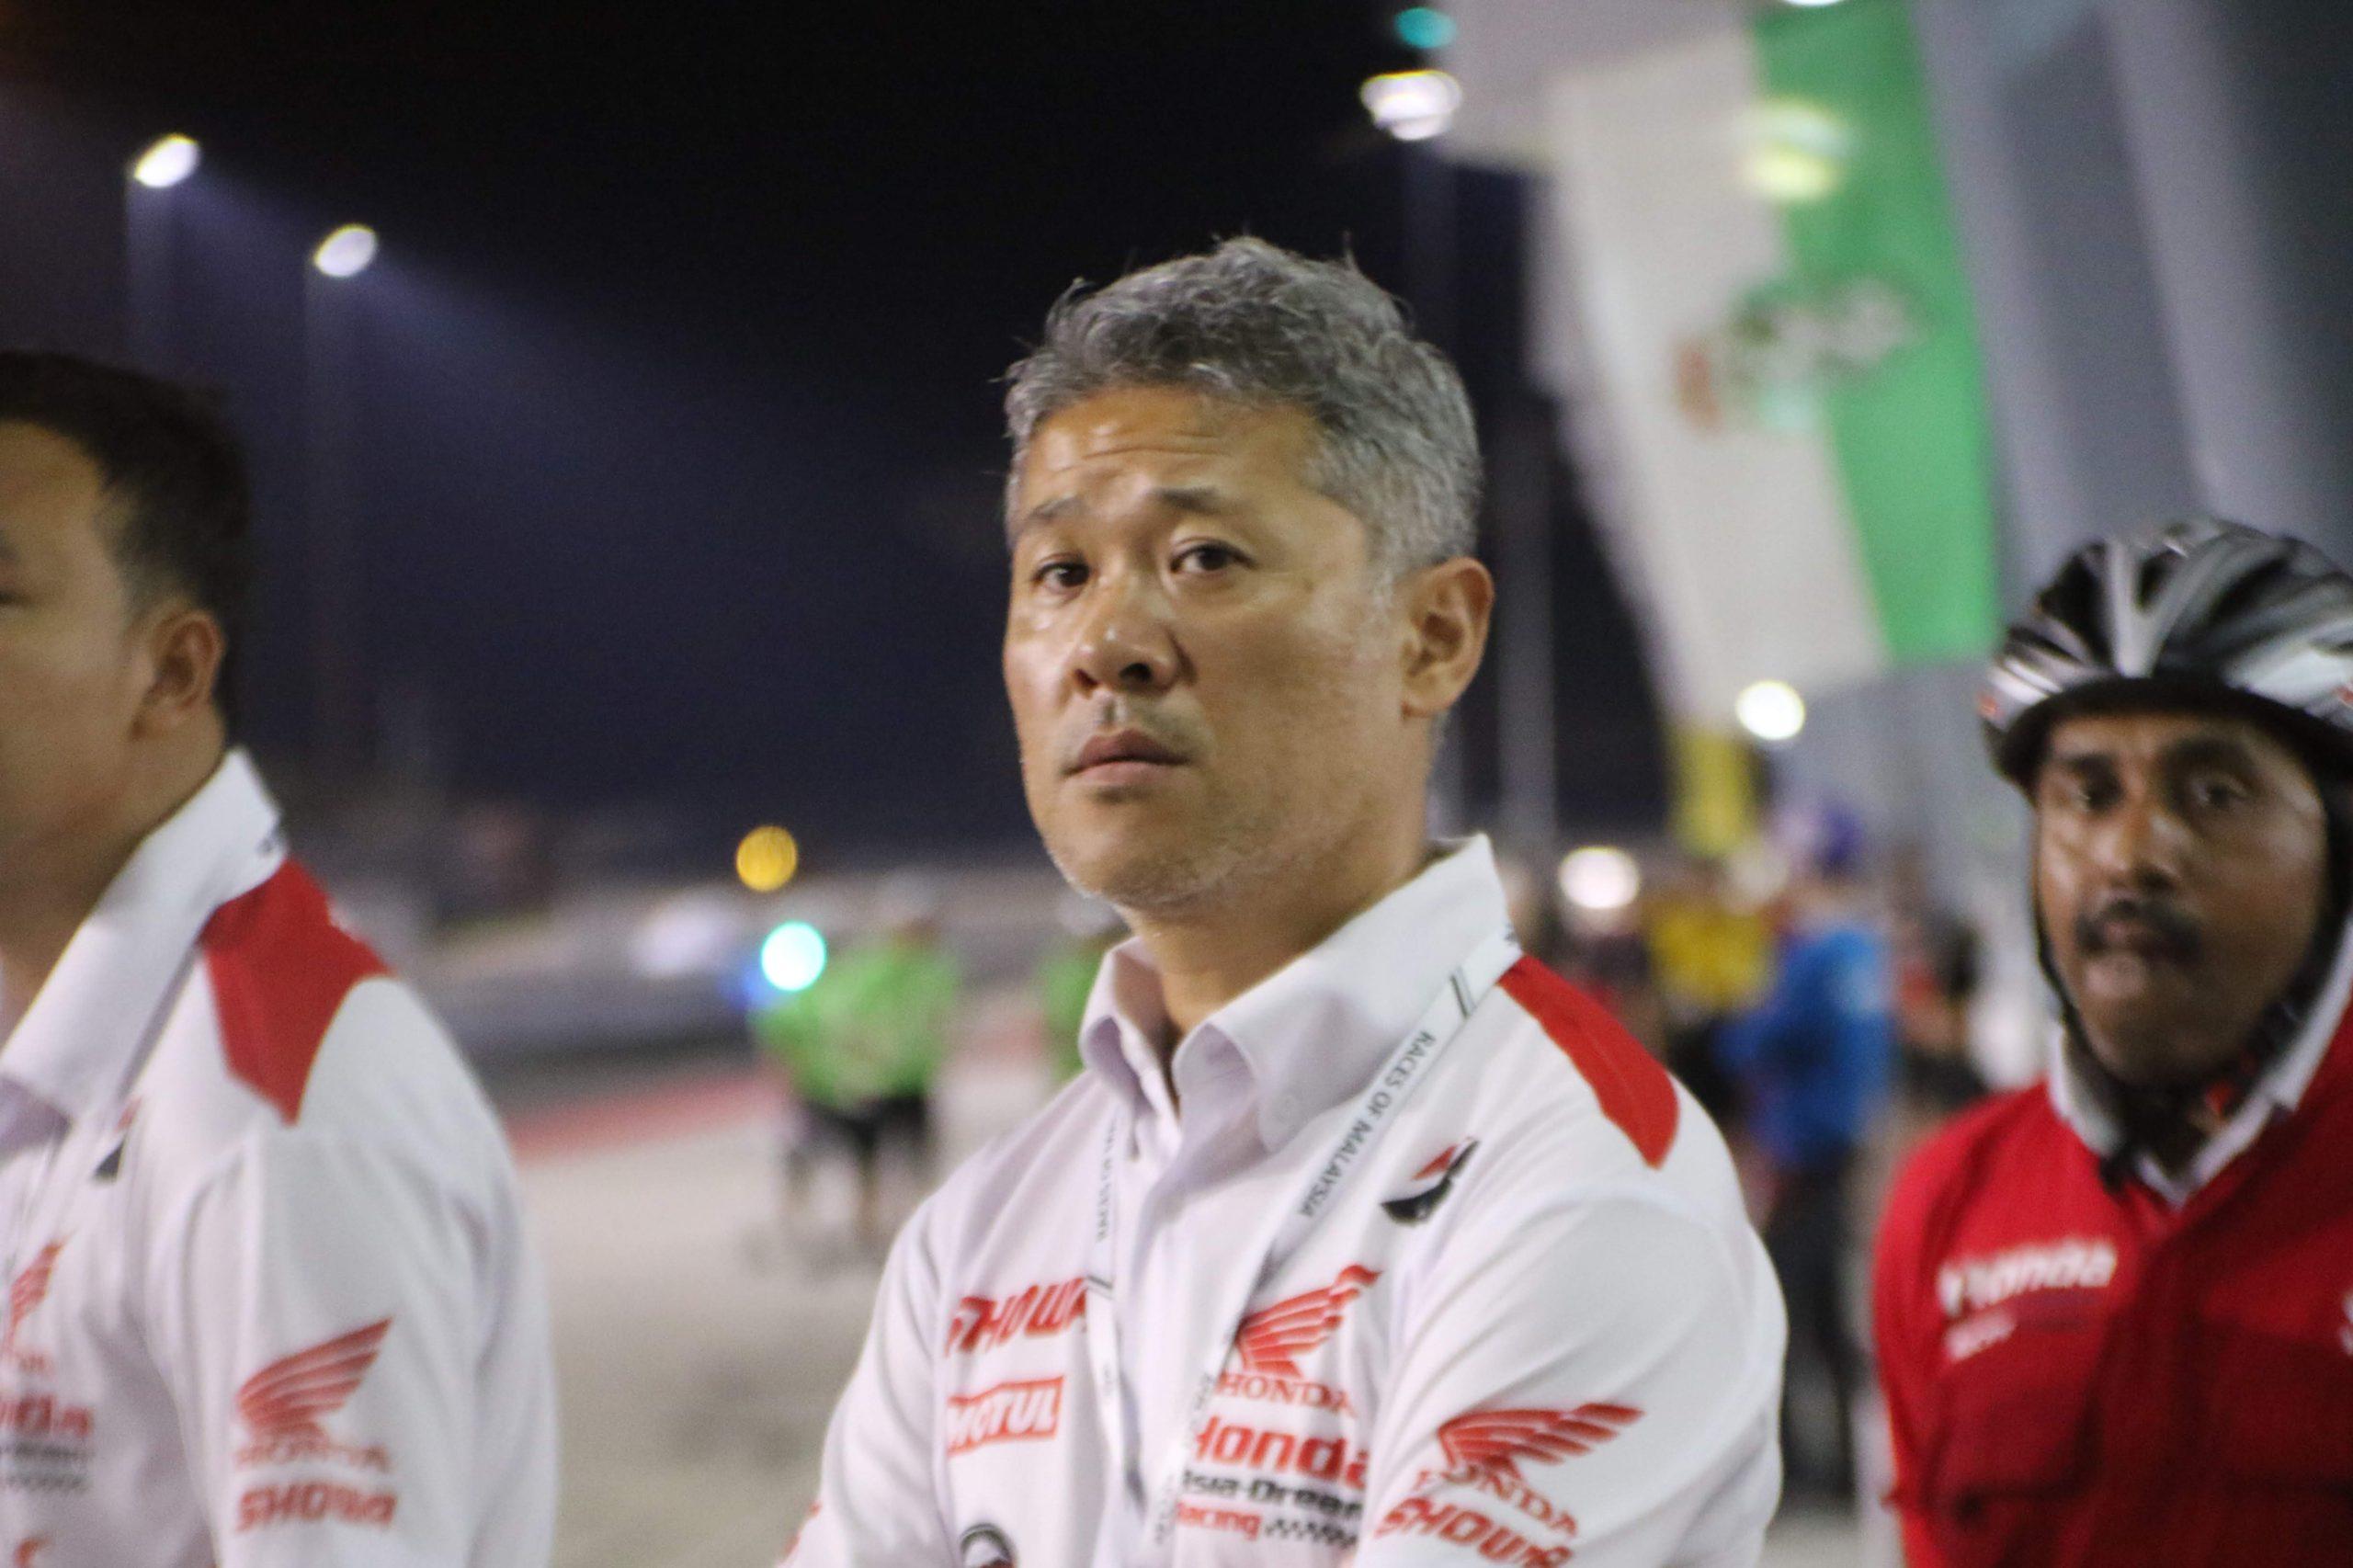 EWCセパン8耐総合2位! 「ライダーのポテンシャルを引き出せるチームに成長したことが嬉しい」Honda Asia-Dream Racing with SHOWA